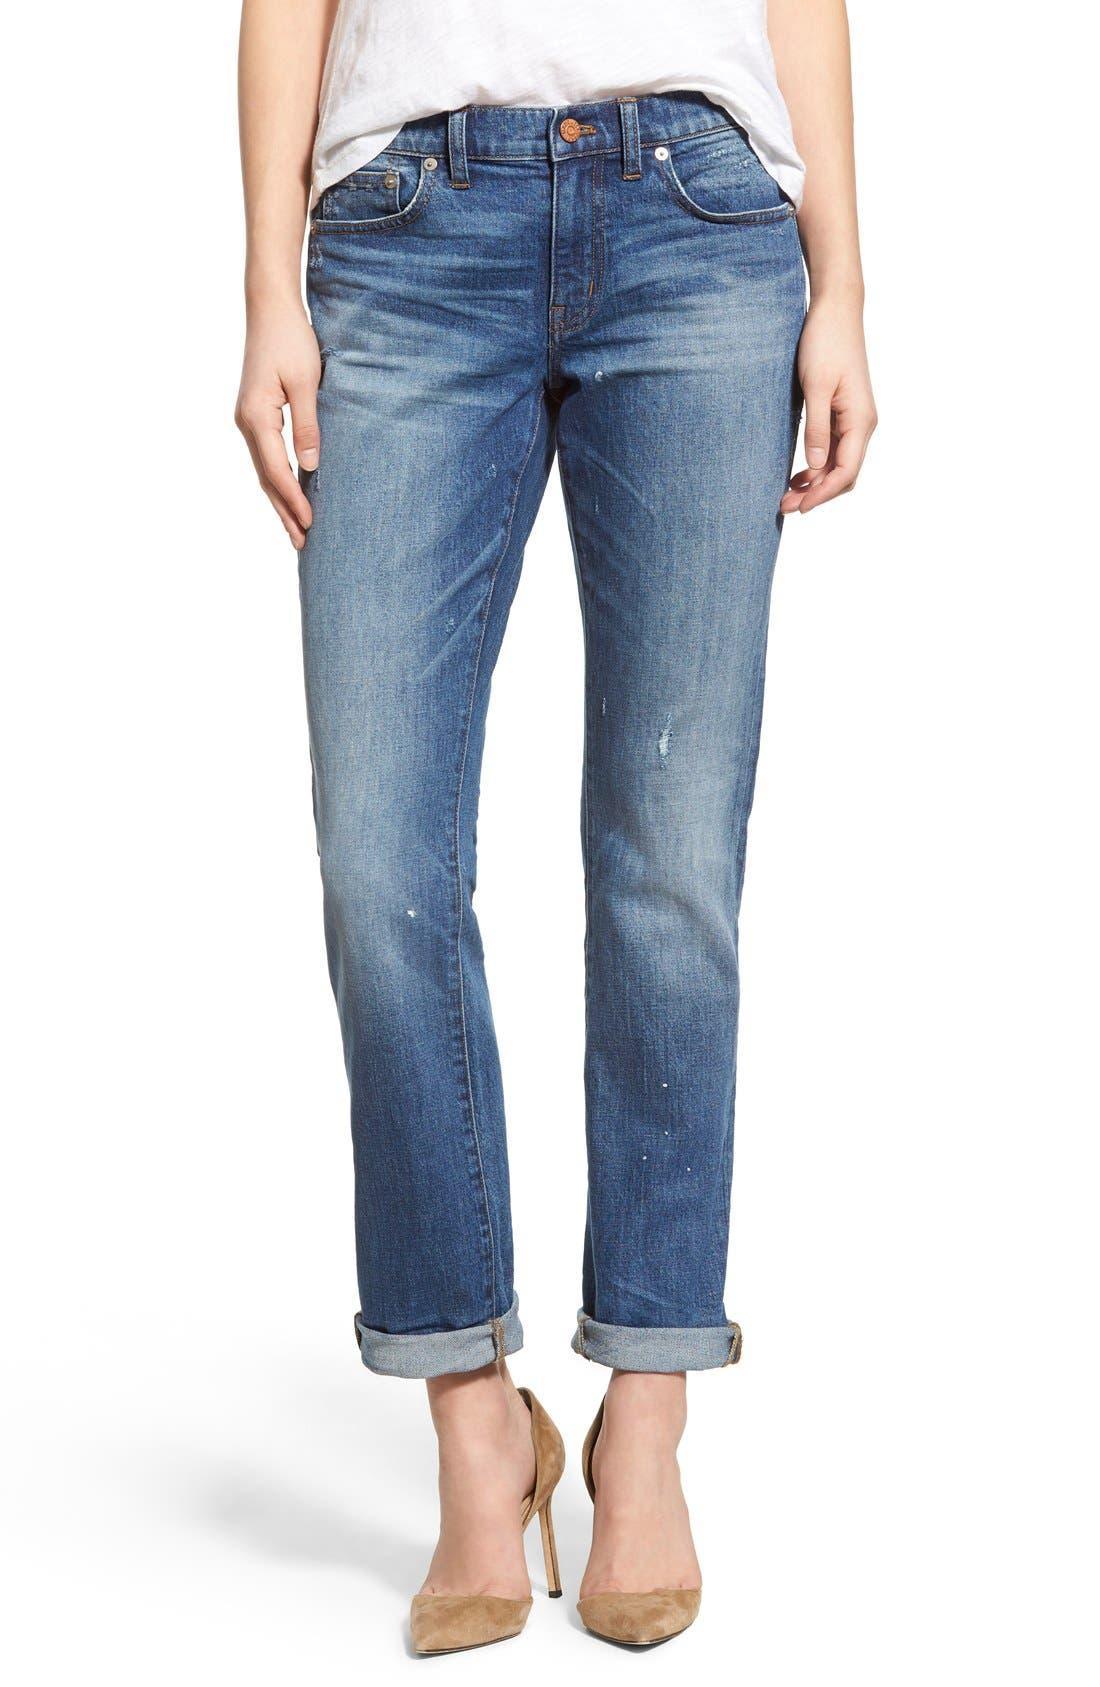 Alternate Image 1 Selected - Madewell Slim Boy Jeans (Hatfield)